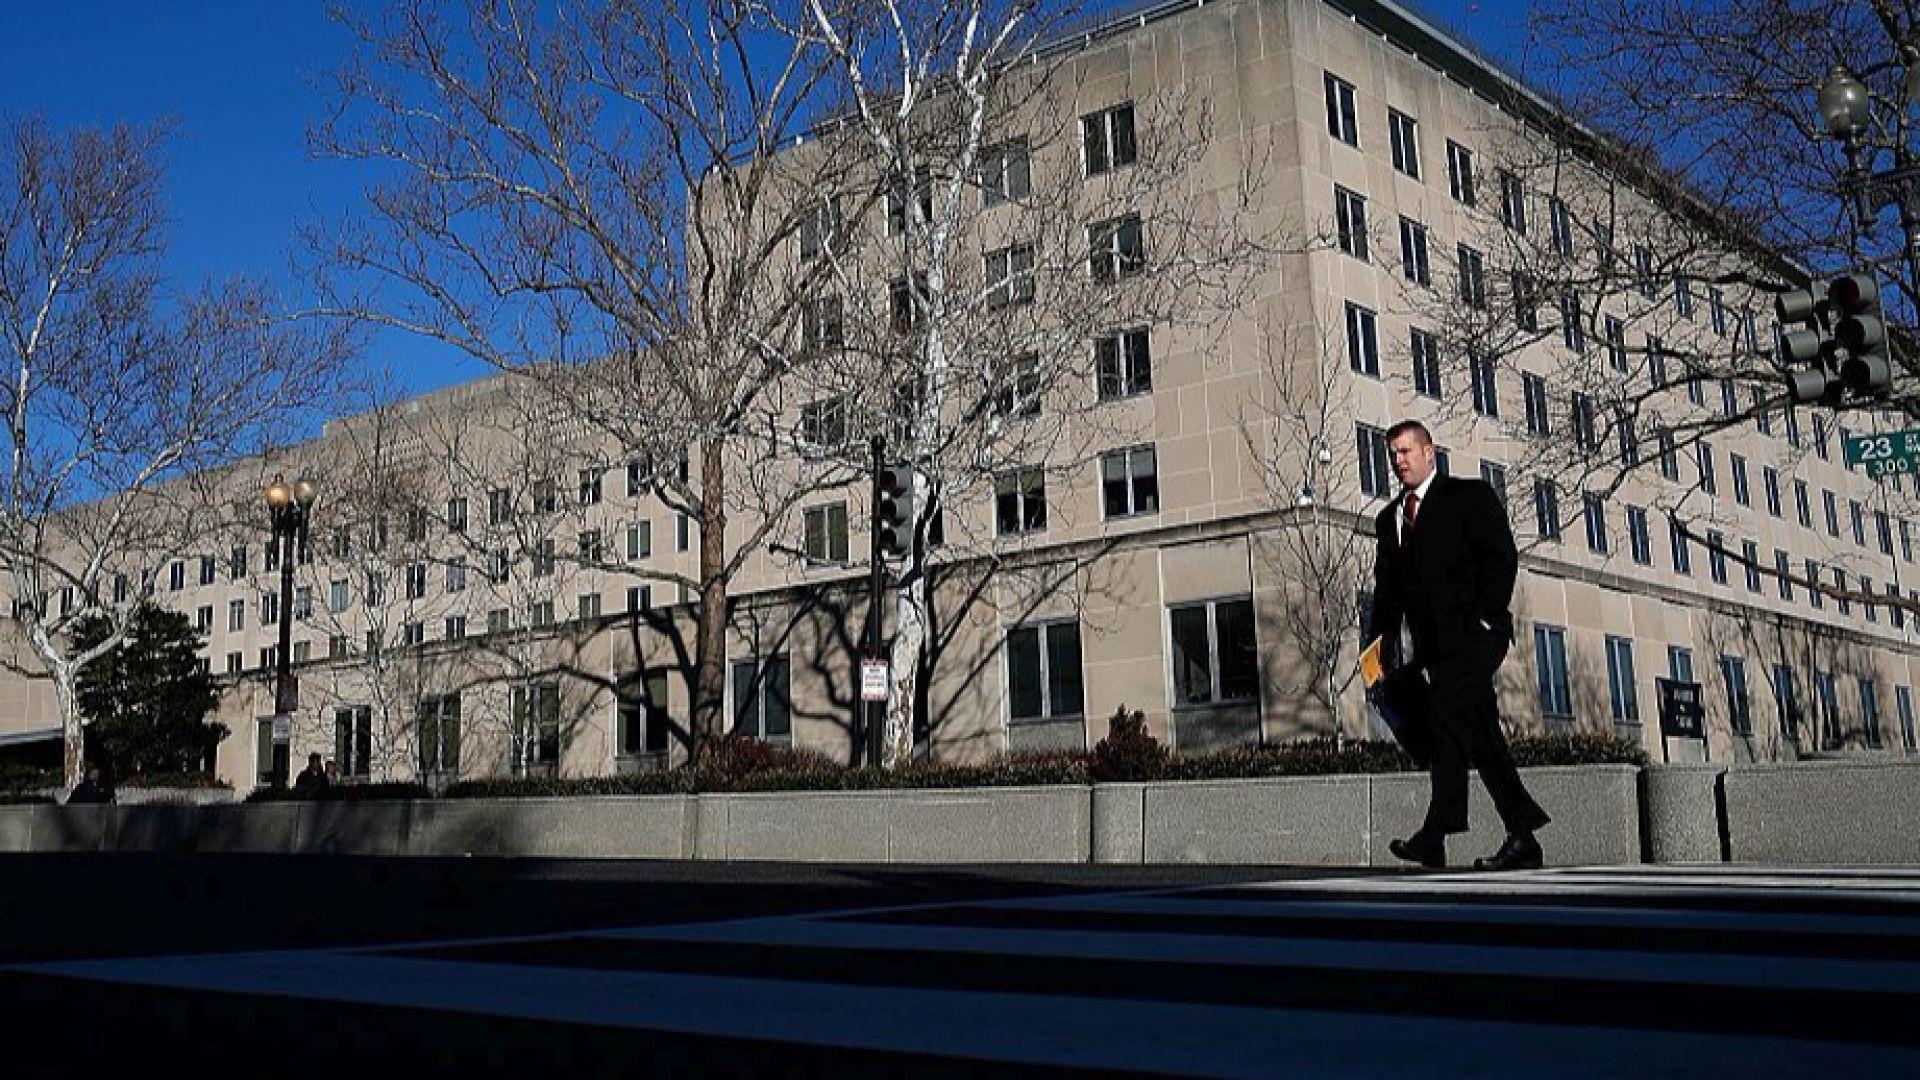 Щатските власти влезли с взлом в дипломатически имот на Русия